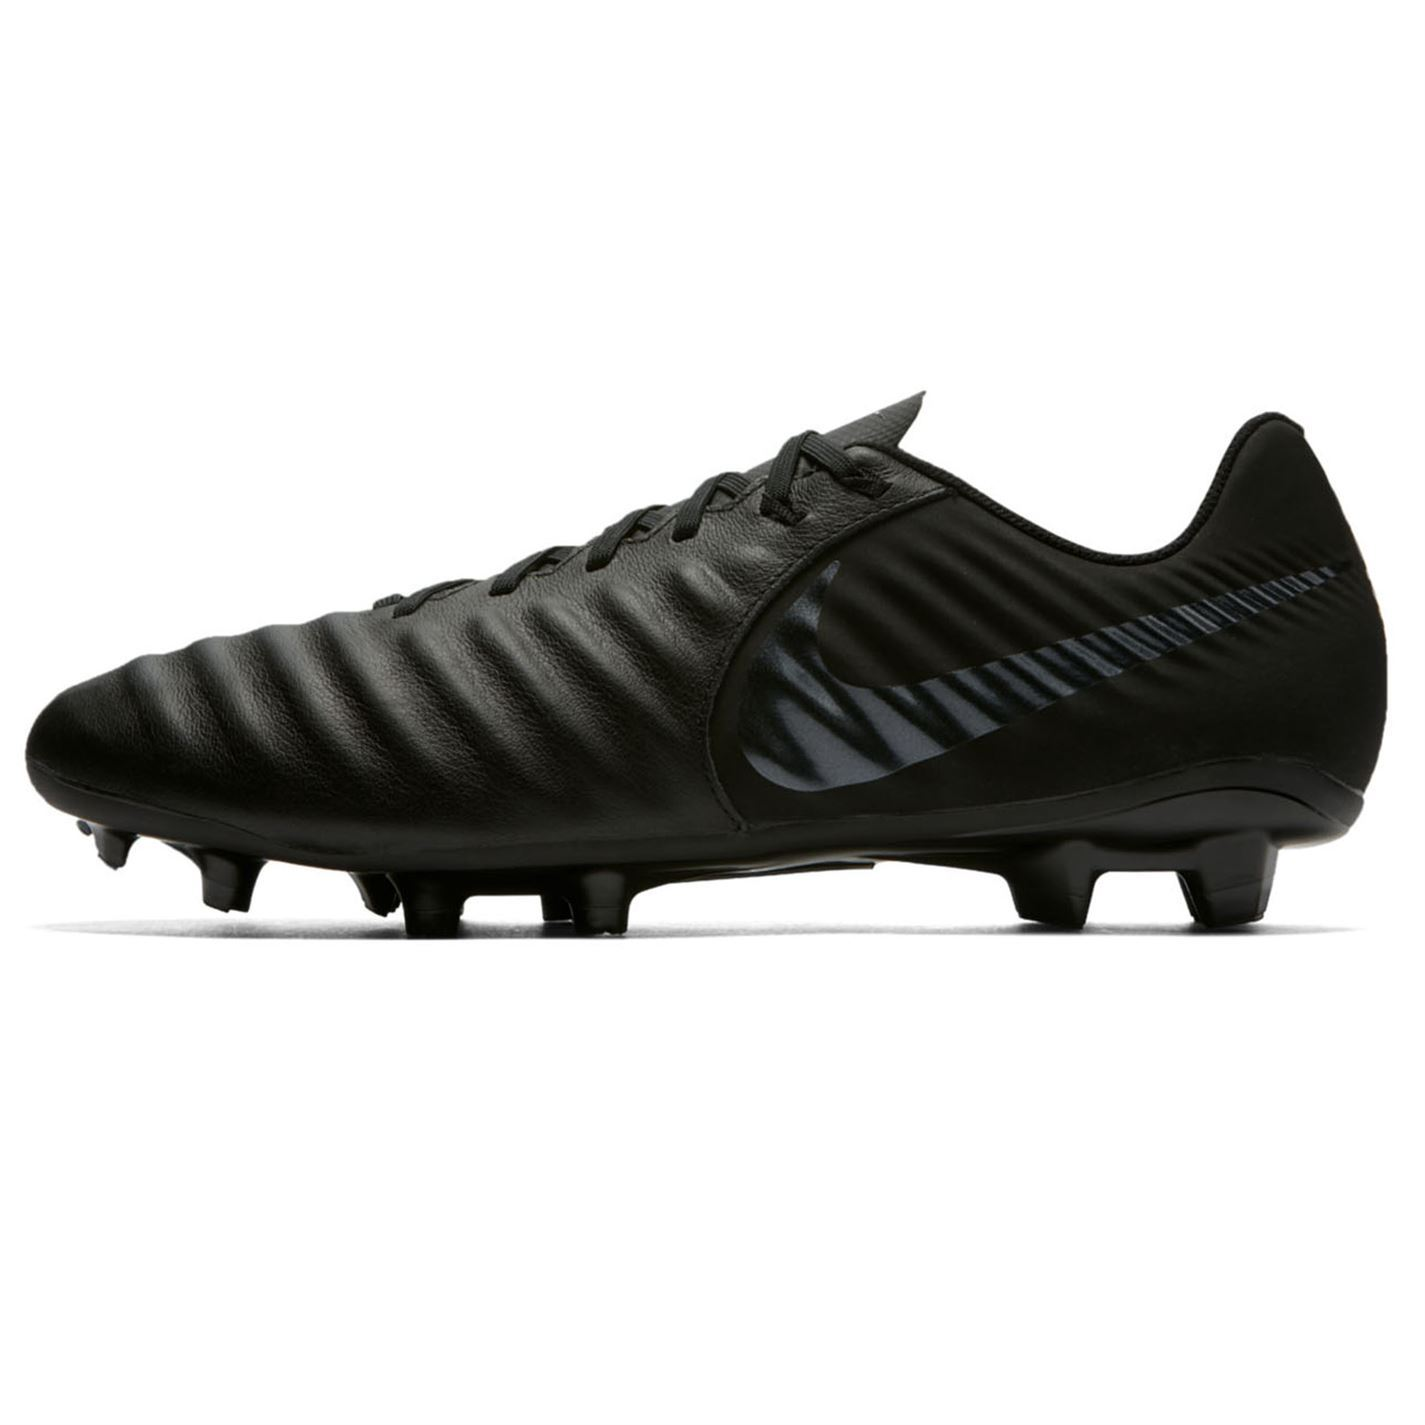 Nike-Tiempo-Legend-Academy-FG-Firm-Ground-Chaussures-De-Football-Homme-Football-Chaussures-Crampons miniature 6